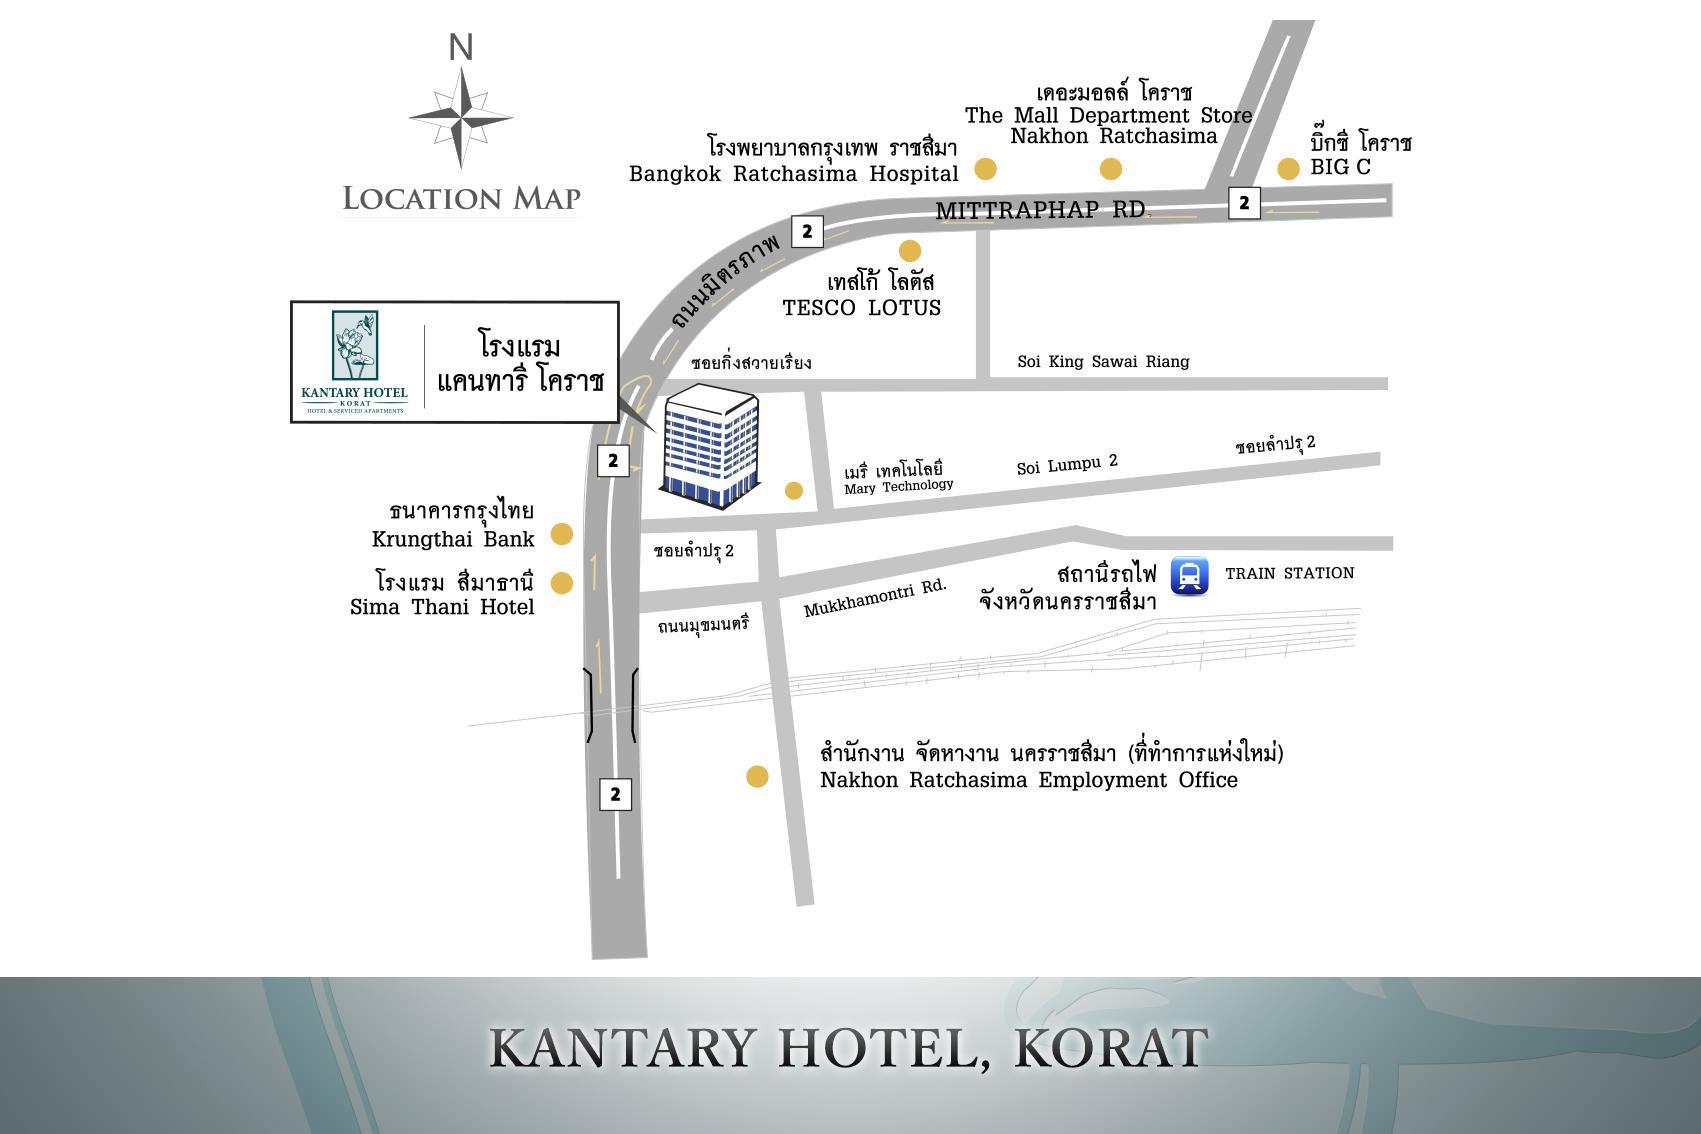 Kantary Hotel and Serviced Apartment Korat แคนทารี โฮเต็ล แอนด์ เซอร์วิซ อพาร์ตเมนต์ โคราช